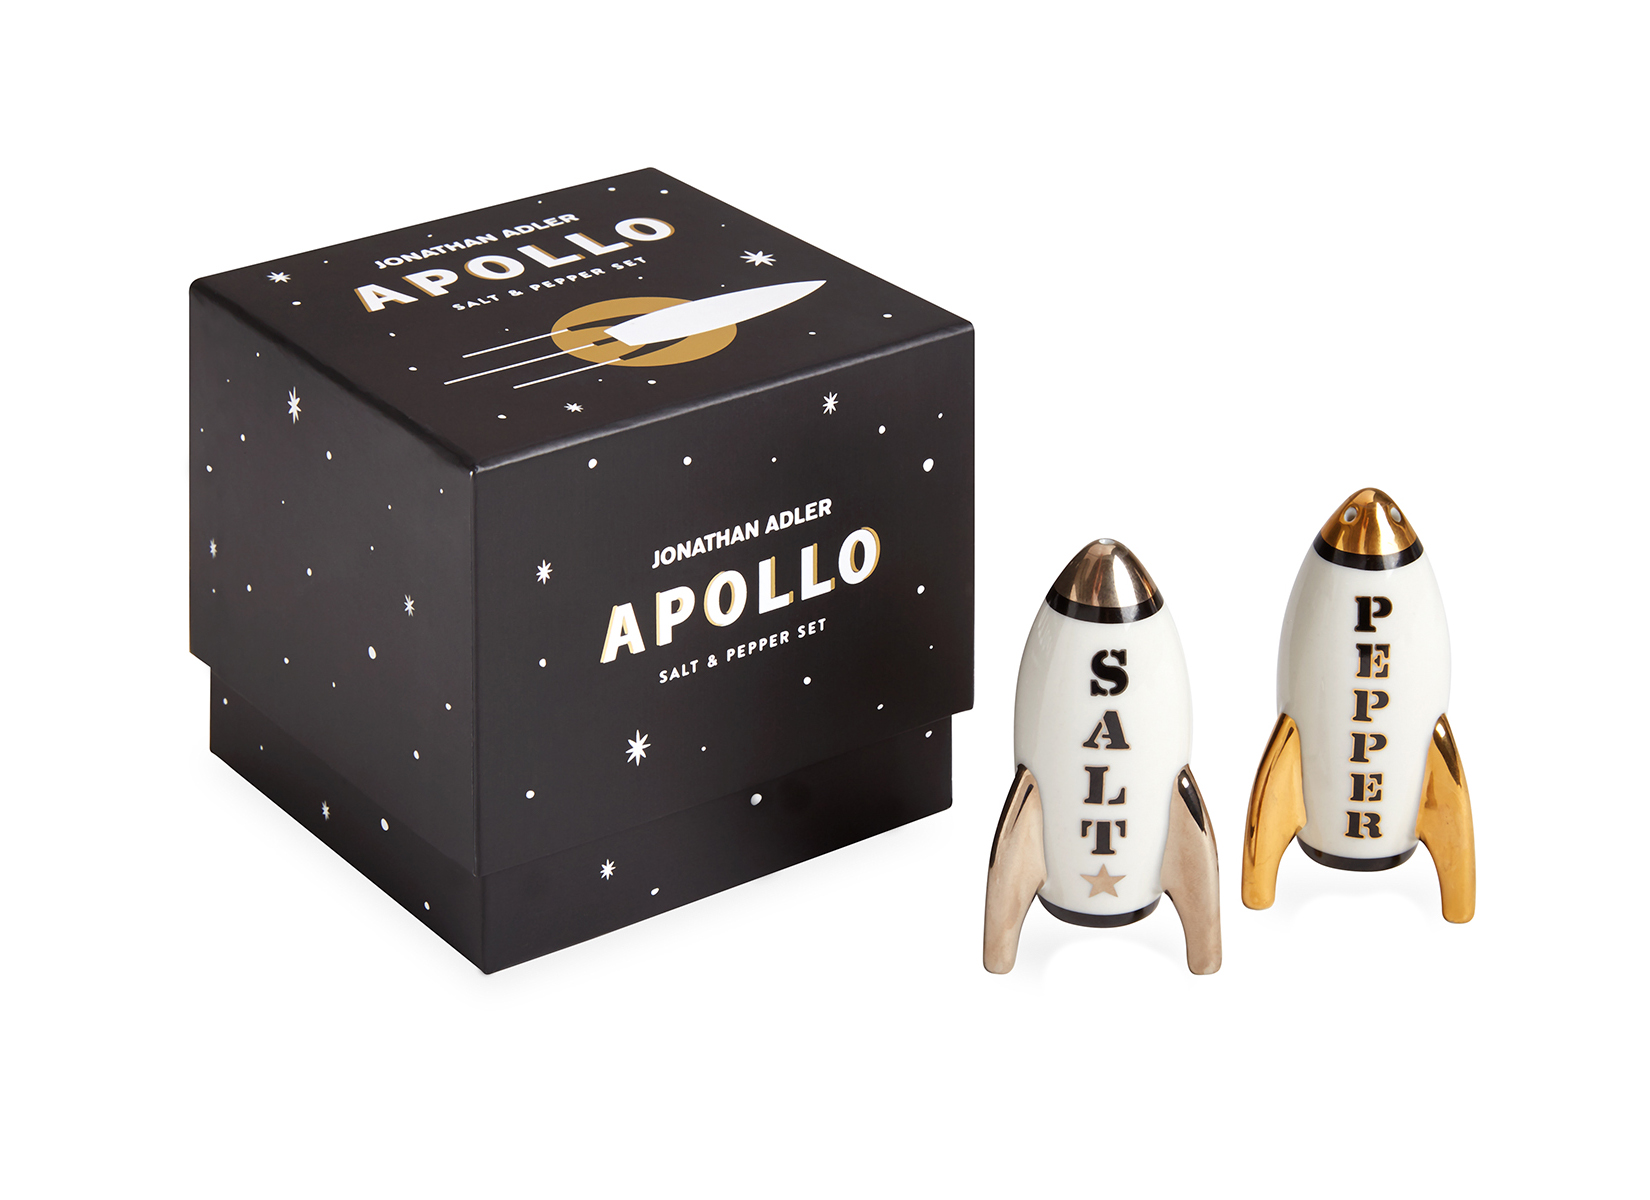 rocket_apollo_atomic_era_mid_century_design_packaging_jonathan_adler.jpg